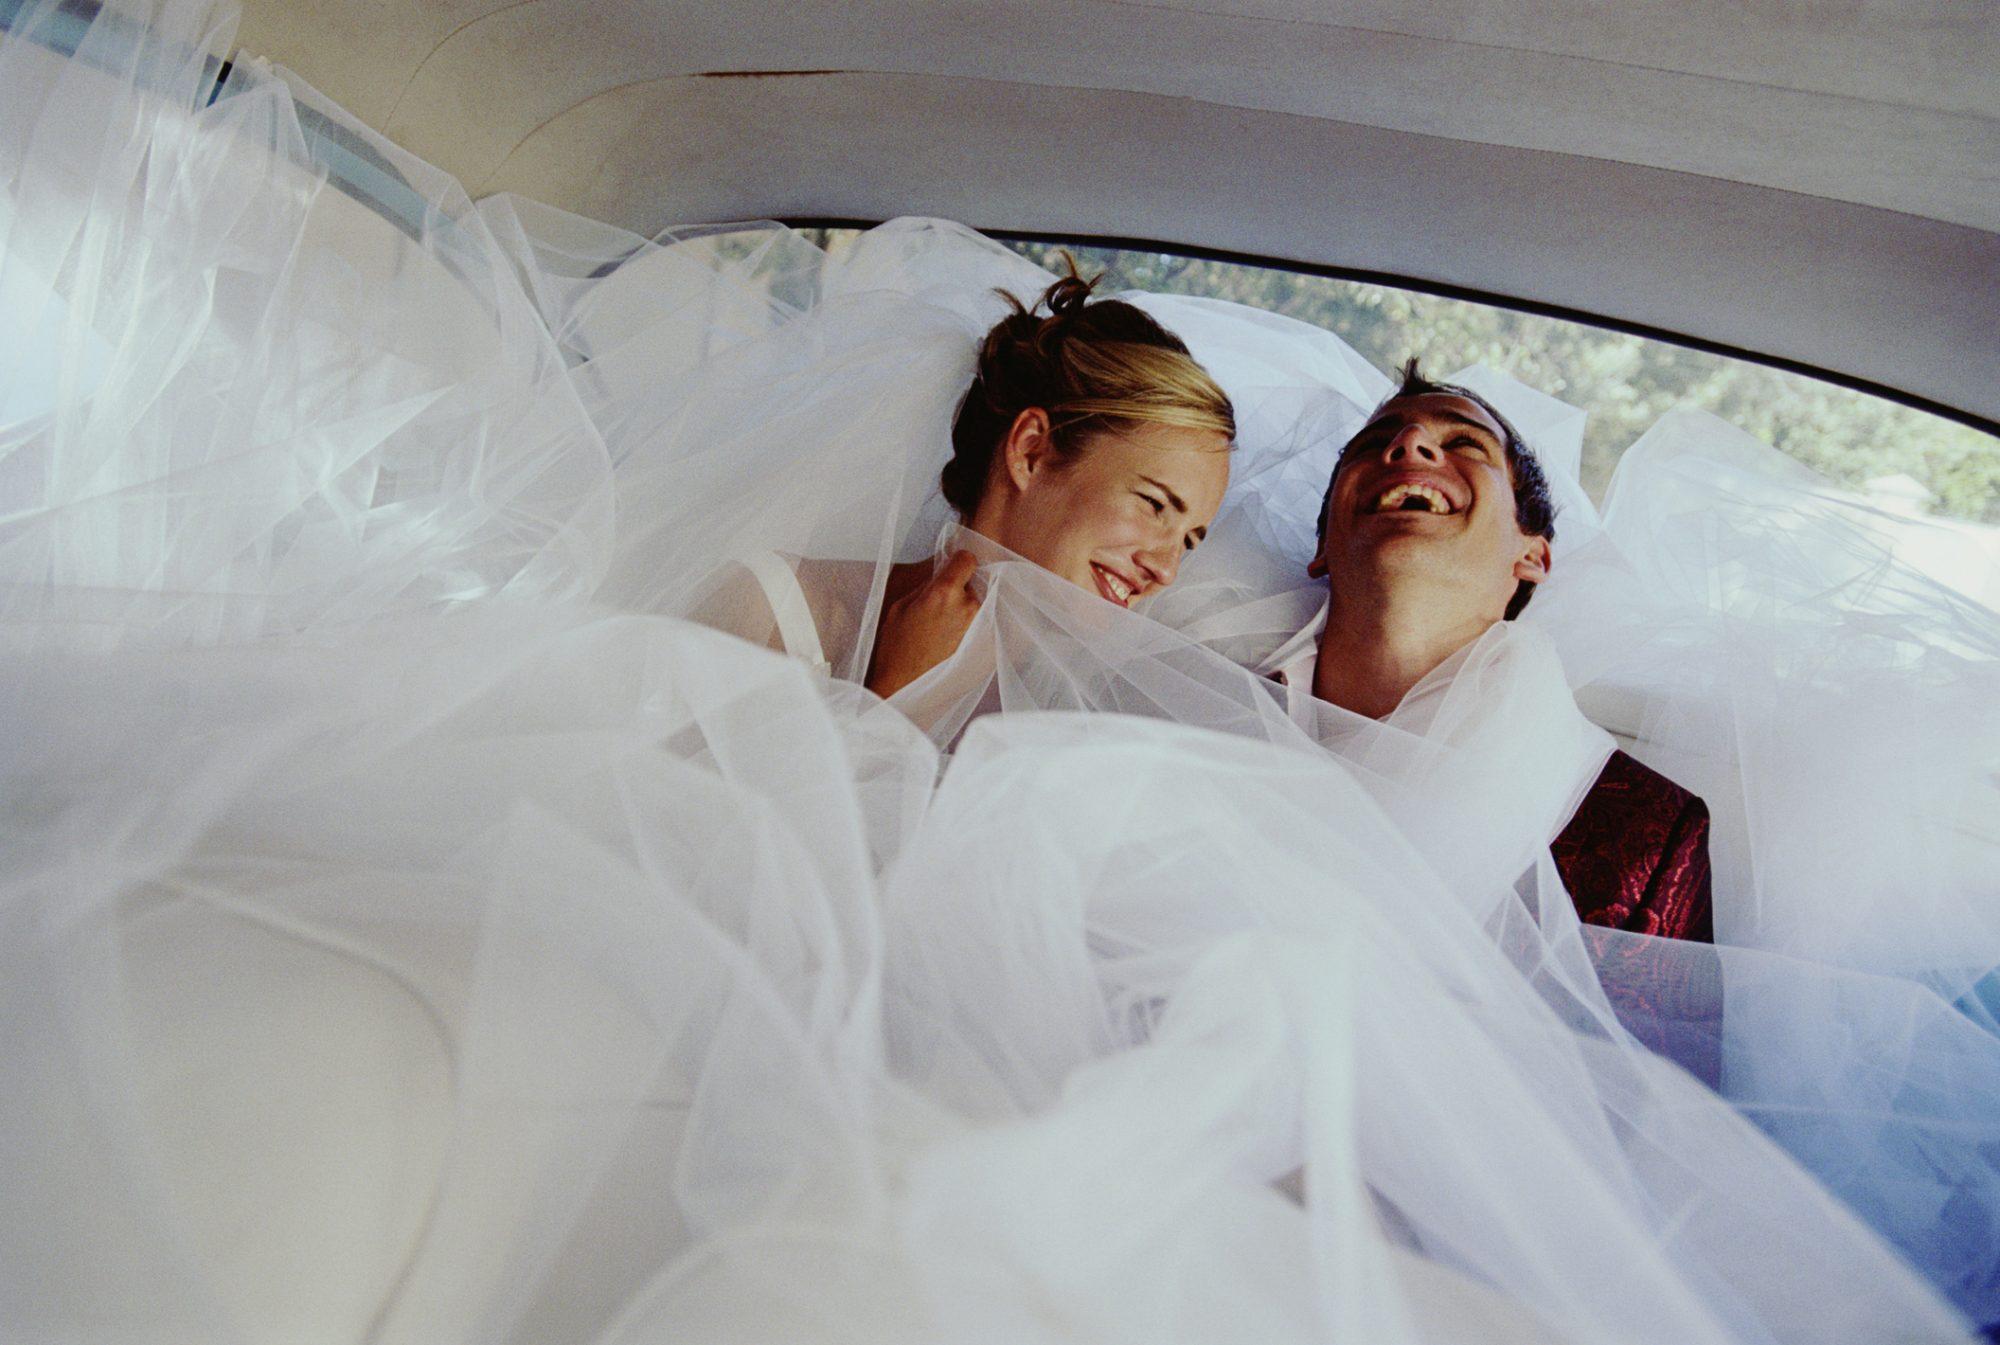 Most popular wedding dress style of 2018